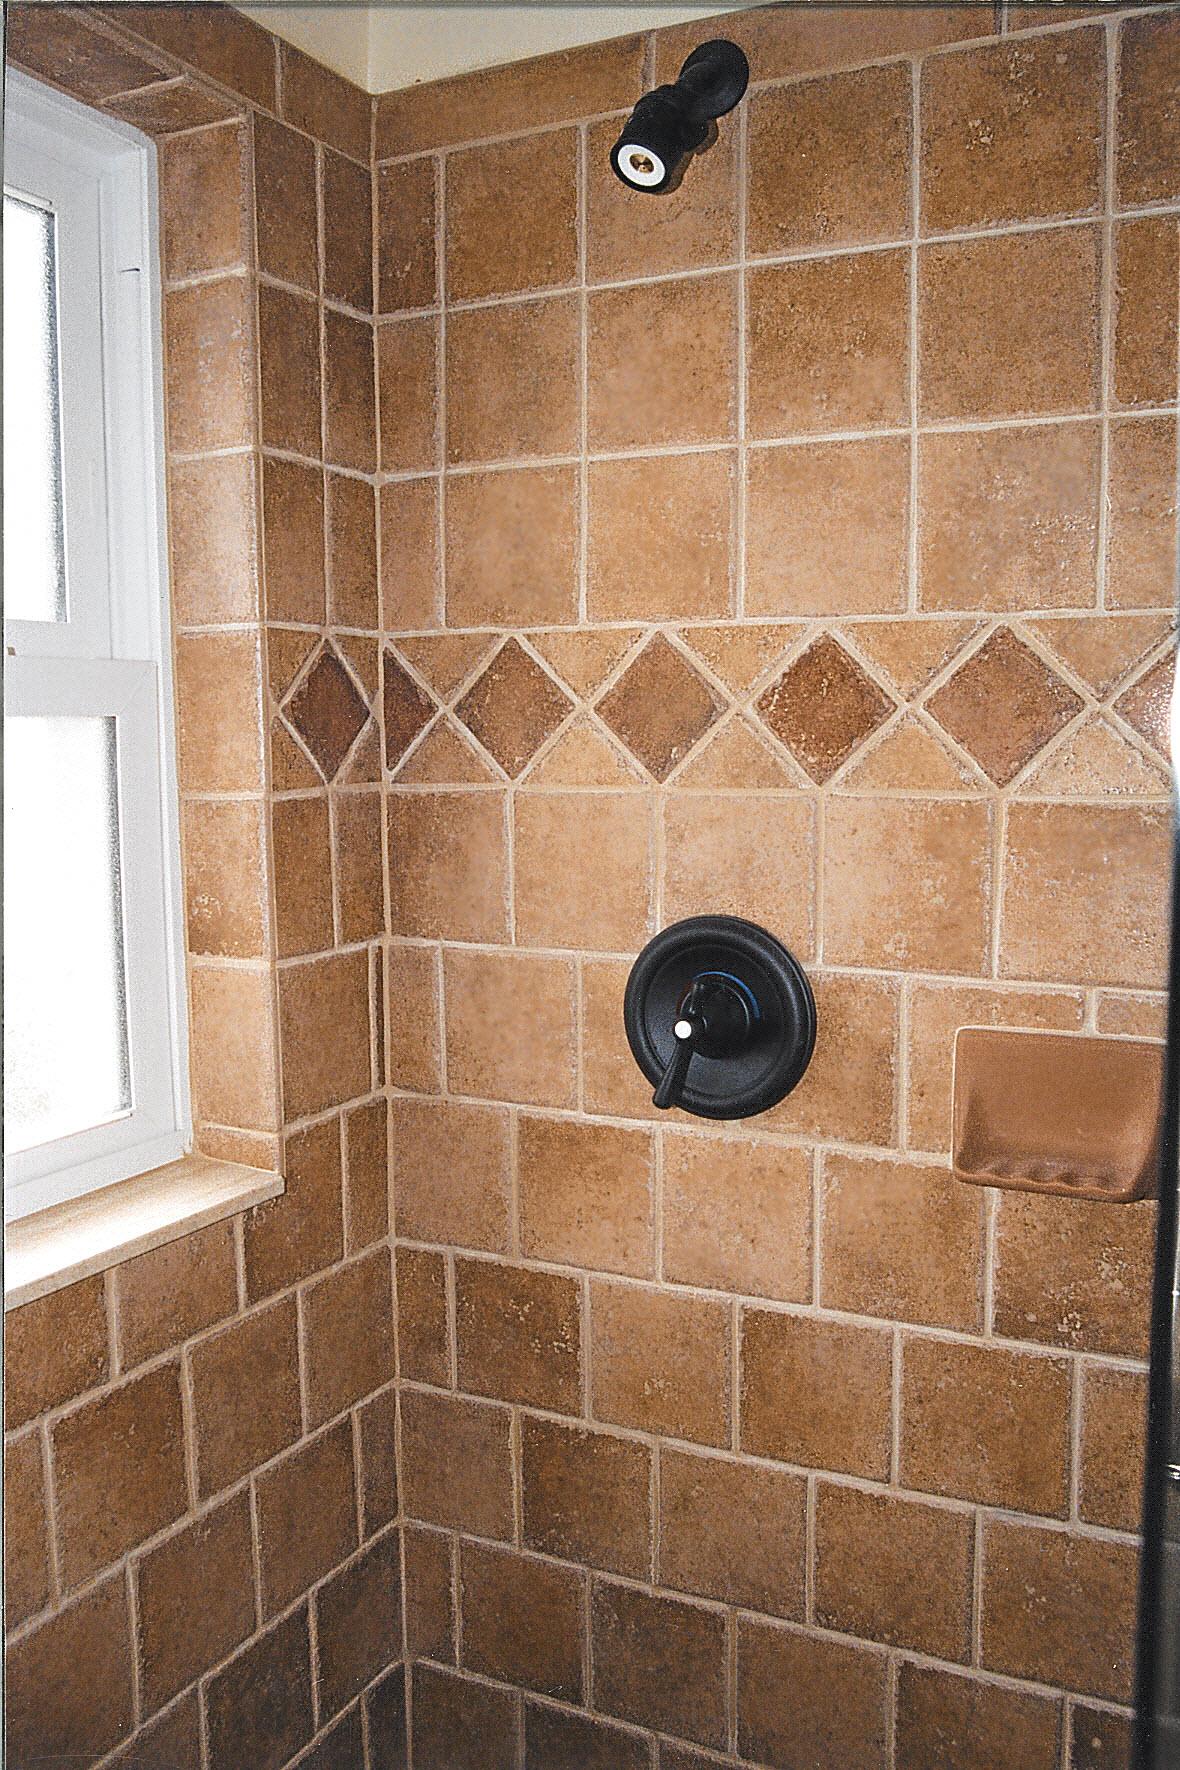 Italian bathroom tile design hawk haven for Tiles for kitchen and bathroom